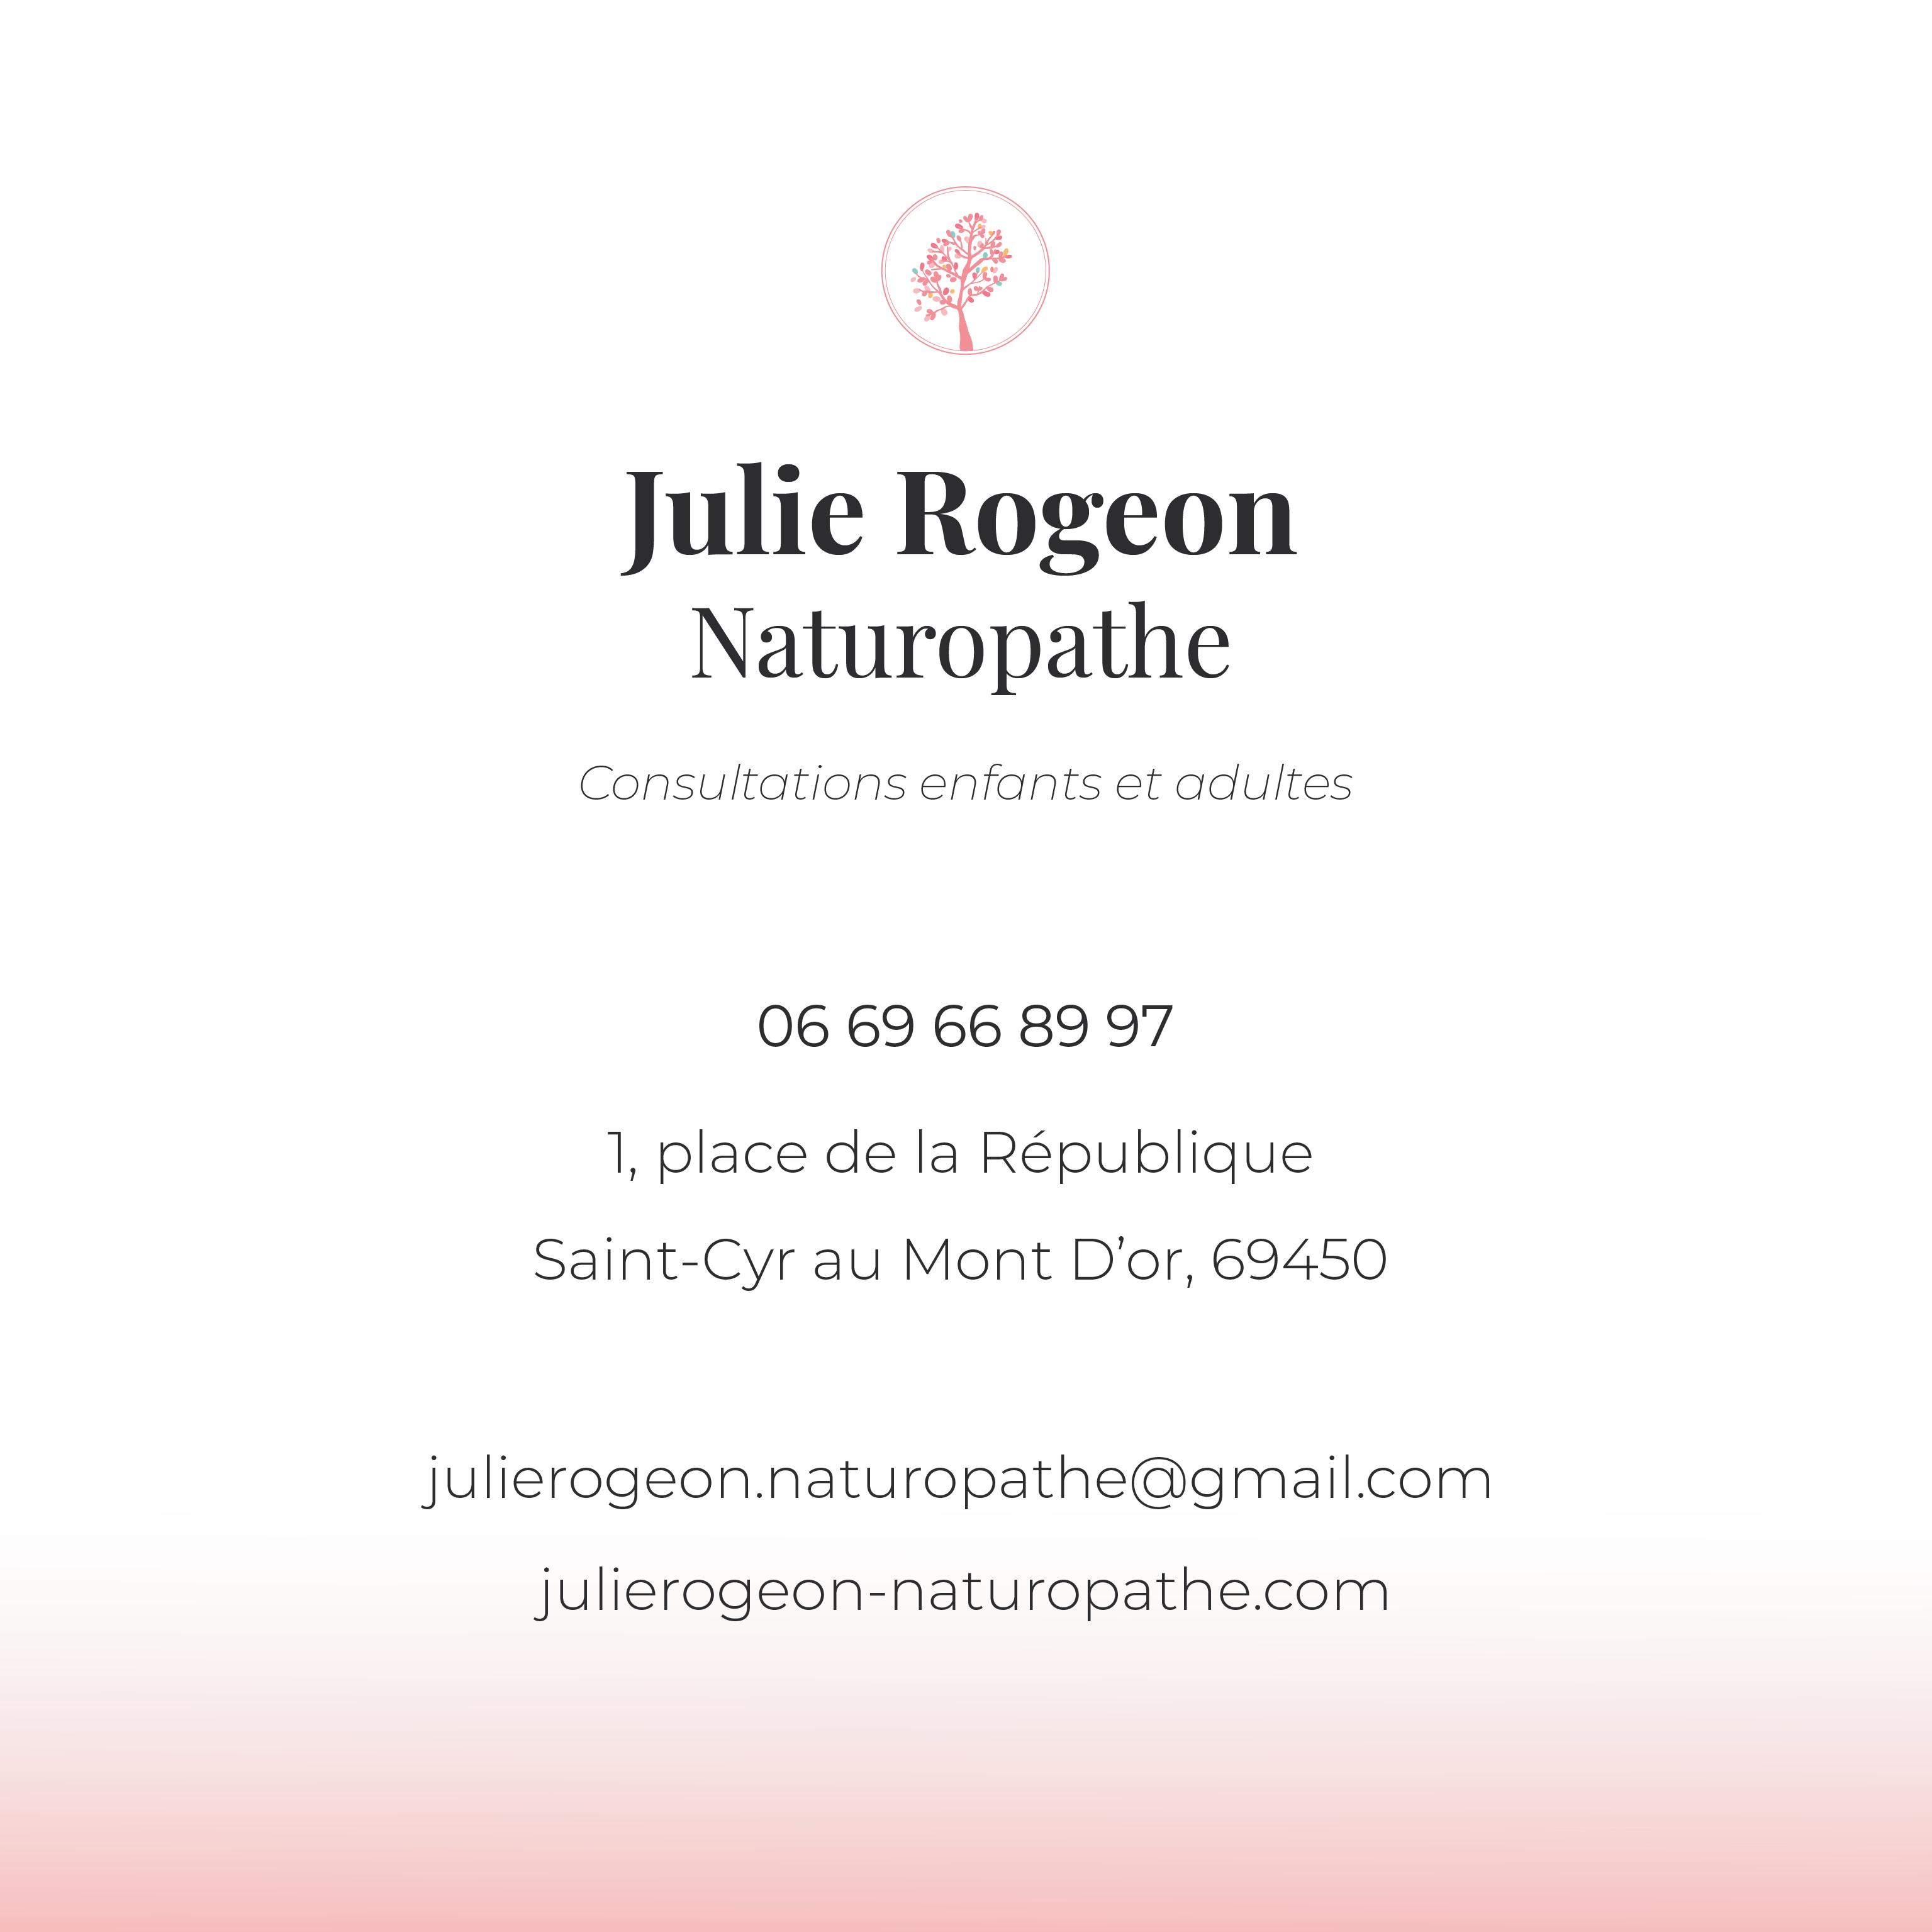 Julie Rogeon : Carte de visite - Verso